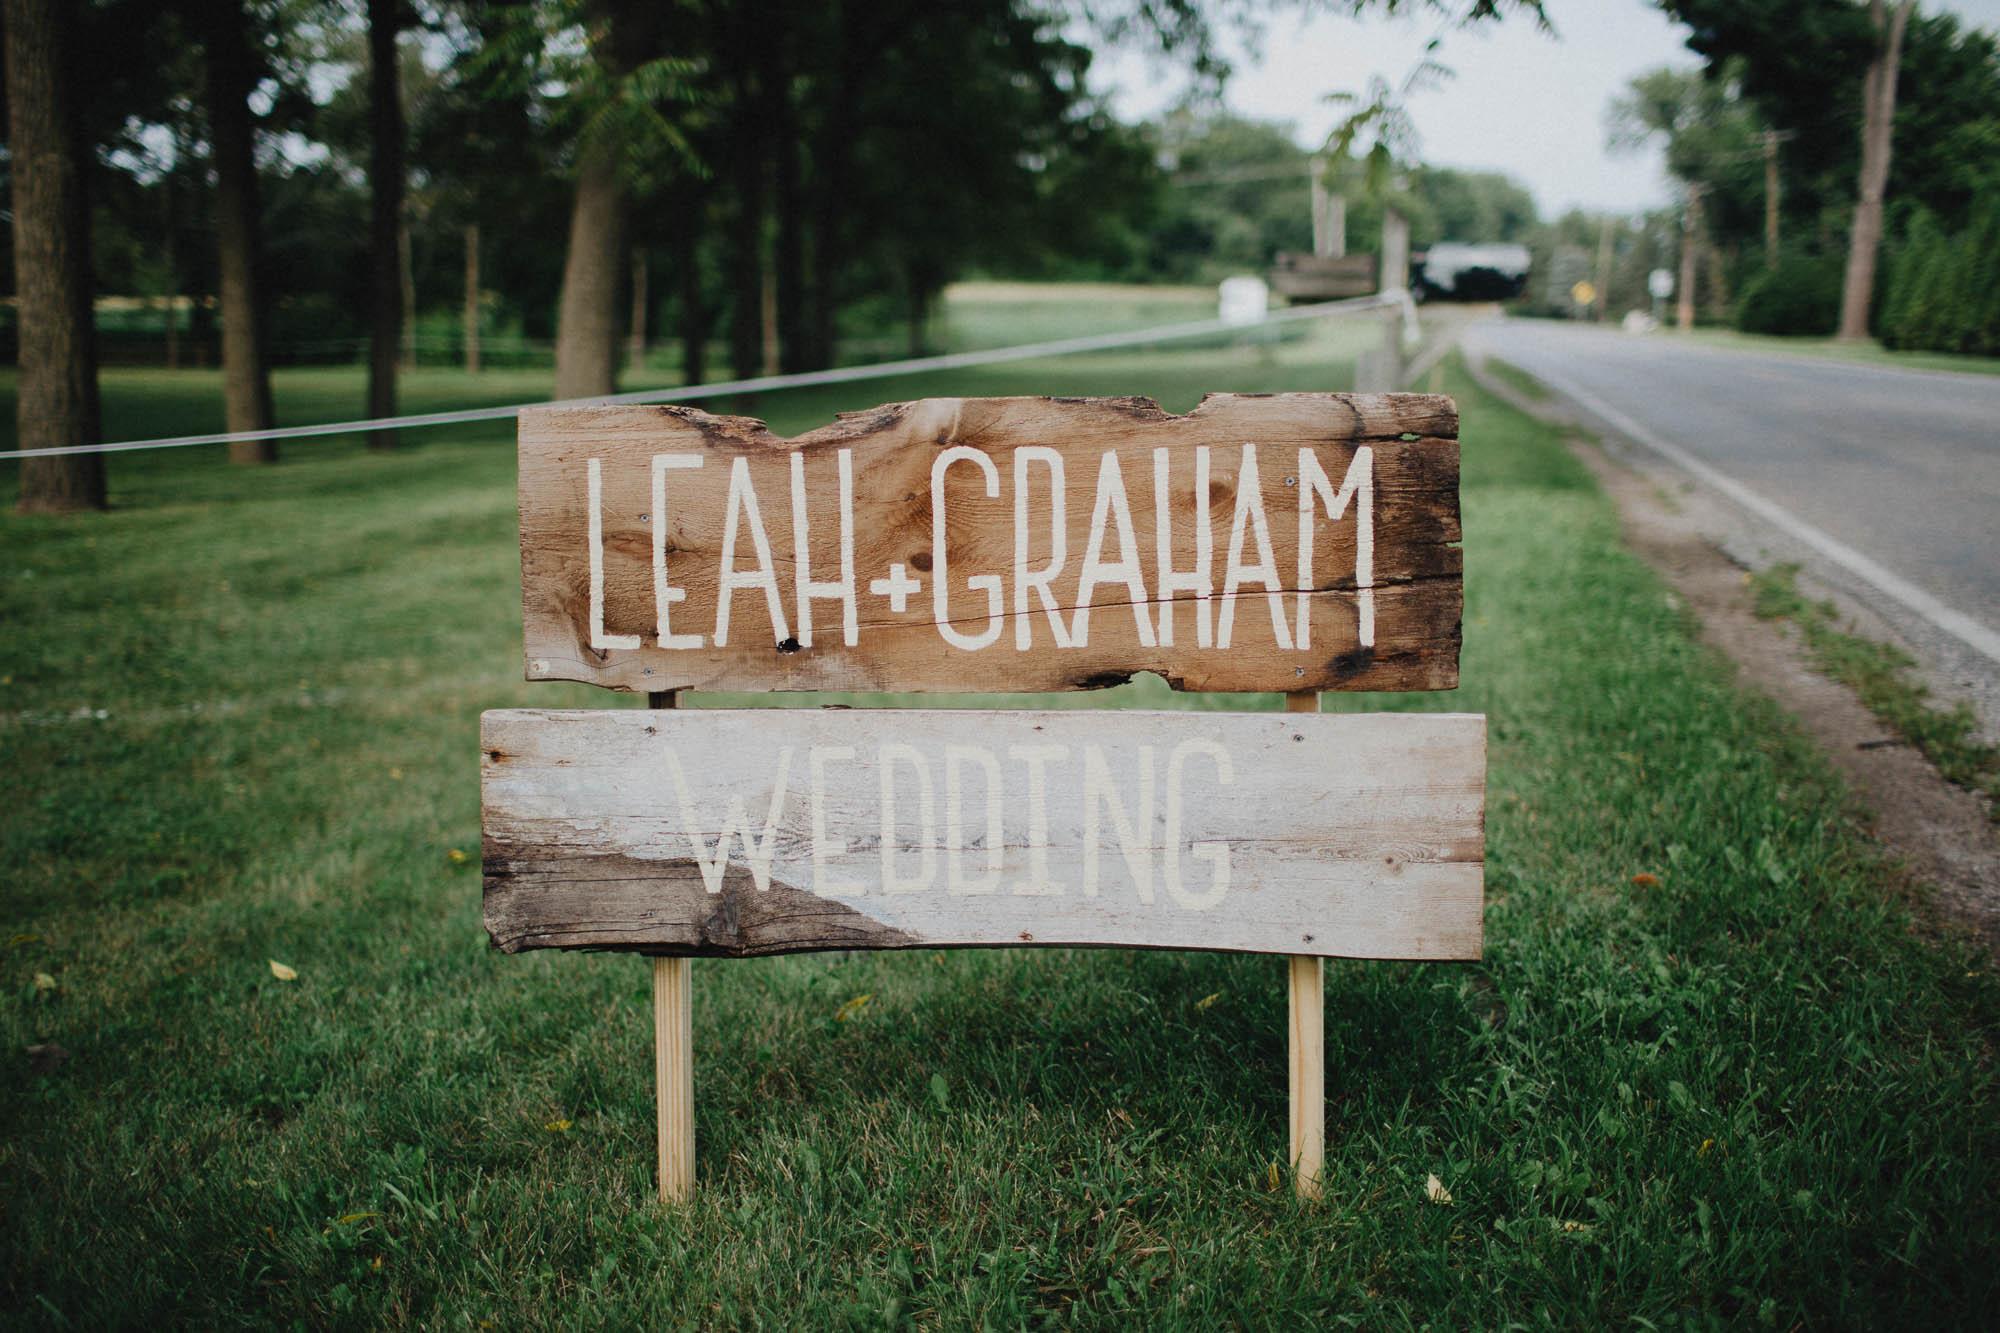 Leah-Graham-Michigan-Outdoor-DIY-Wedding-005@2x.jpg